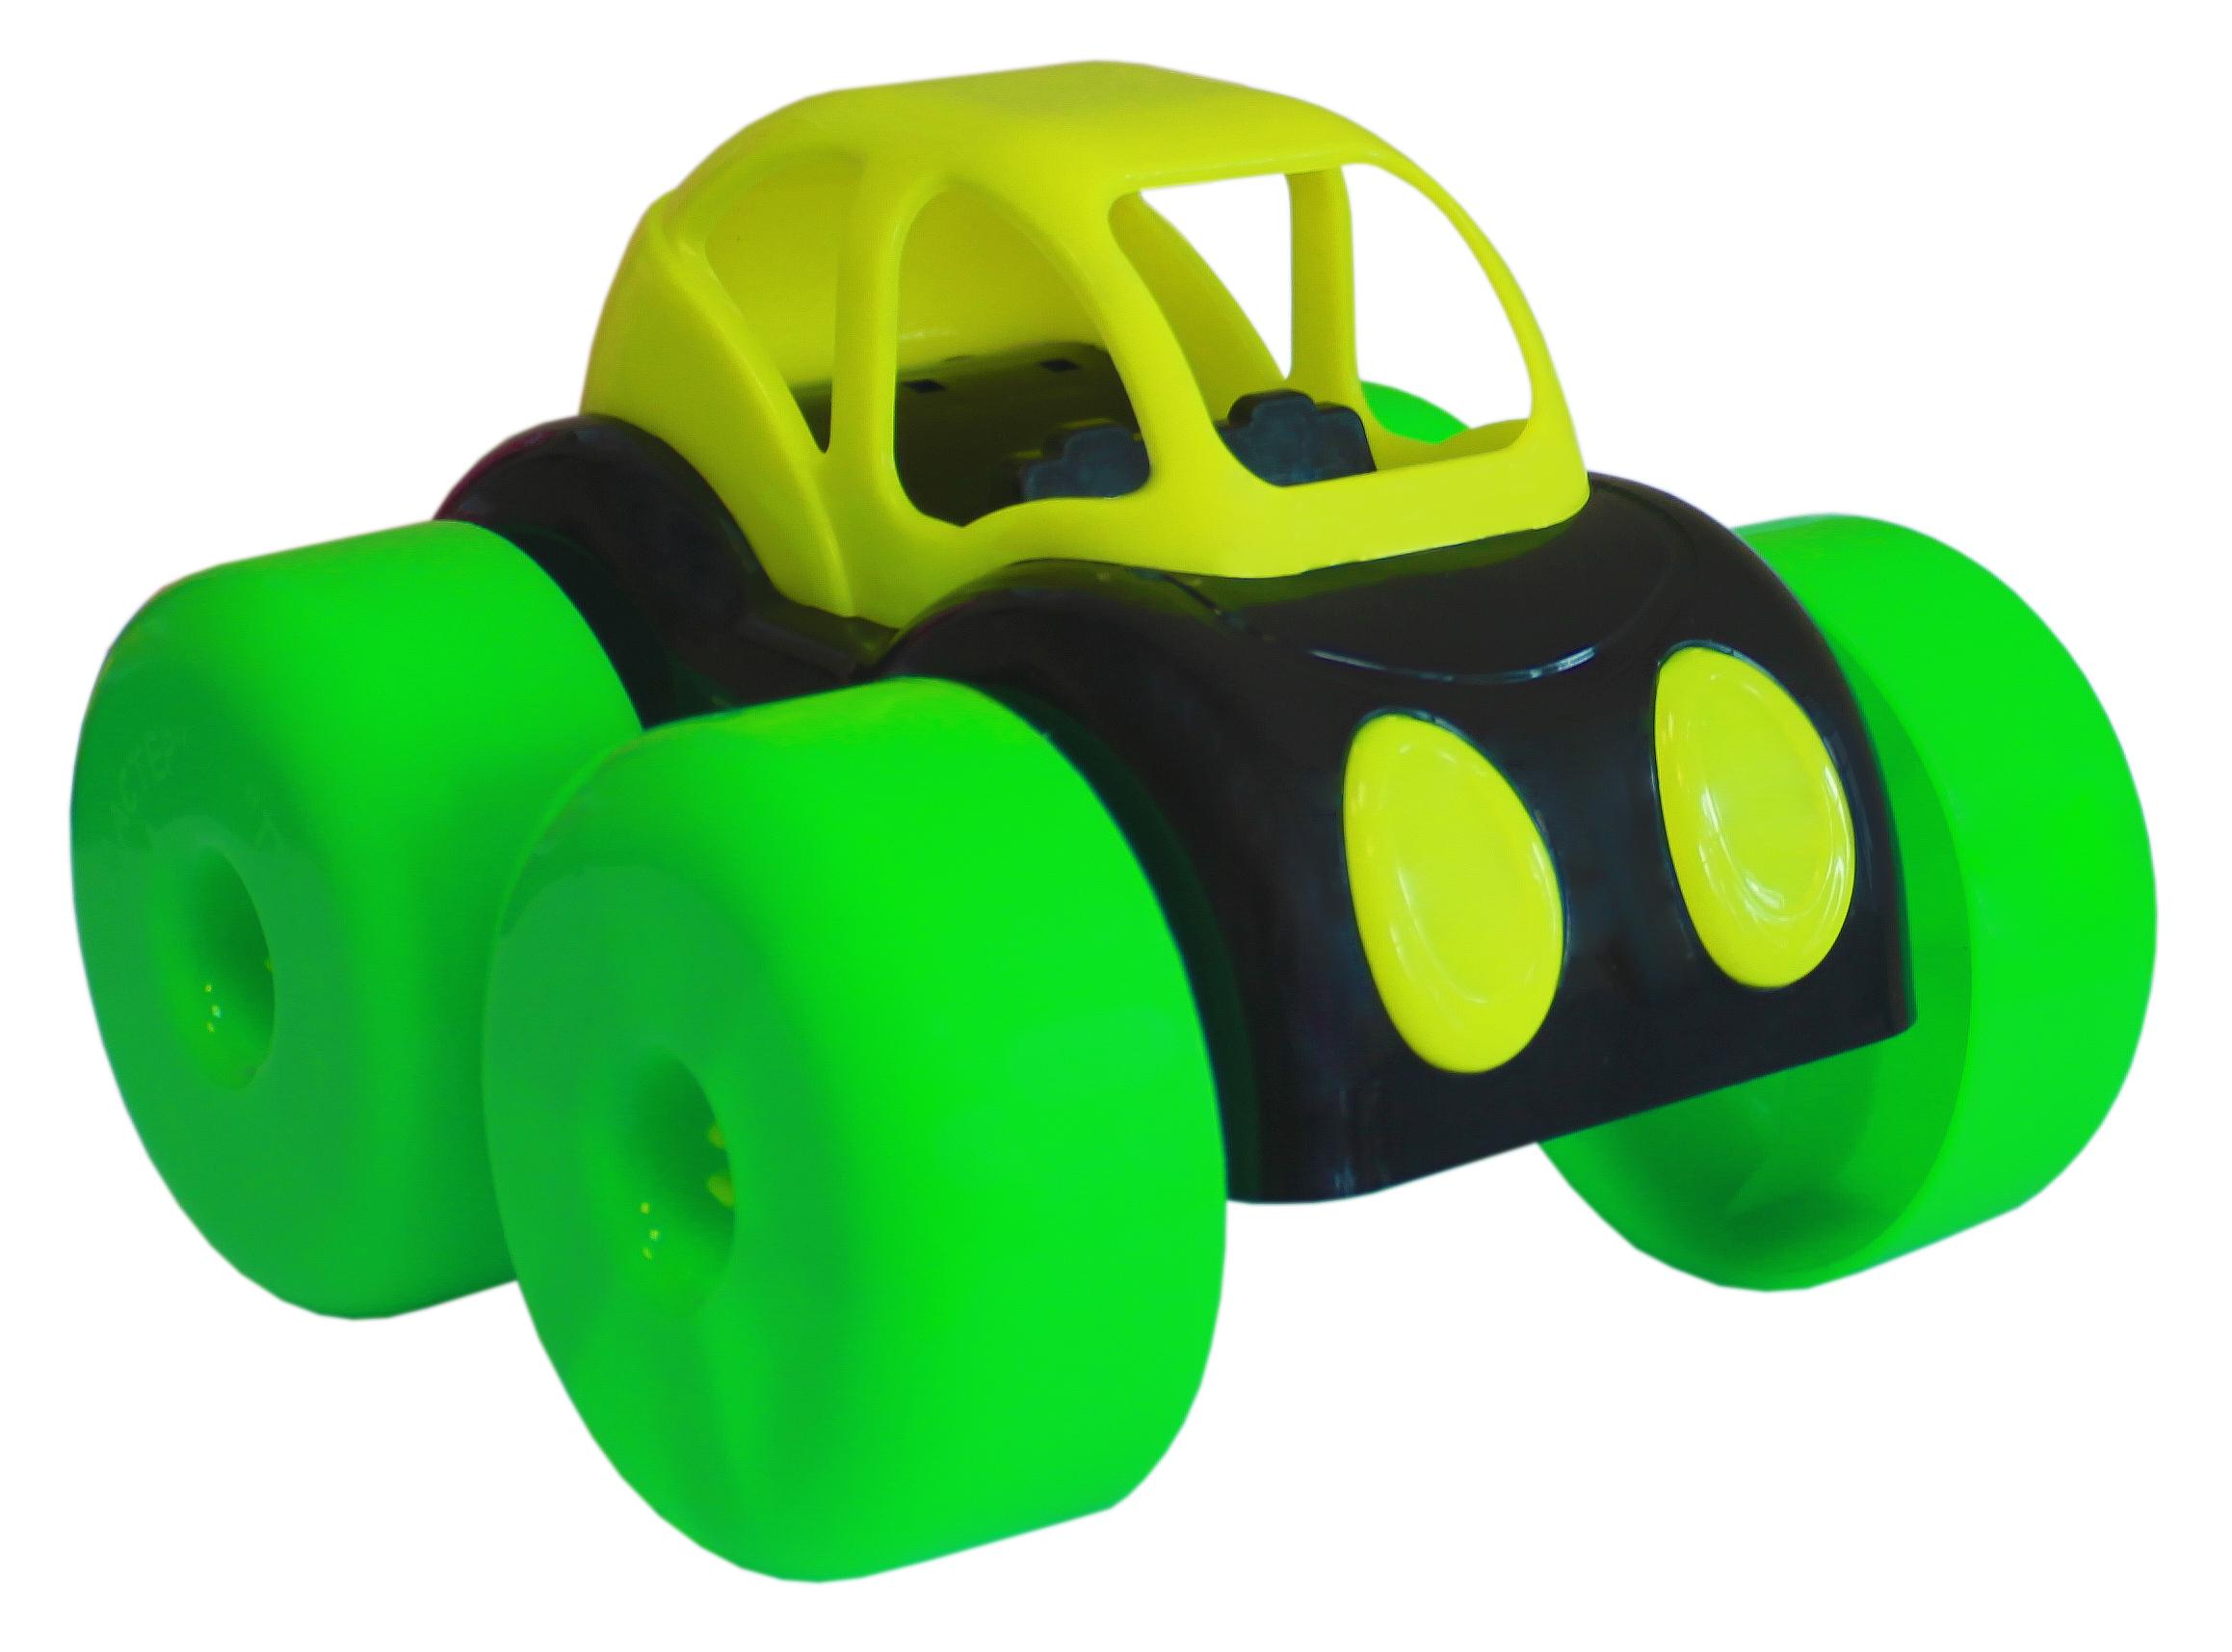 Машинки для малышей Пластмастер Бигвил Гринни nema17 linear stepper motors 400mm length tr8 4 acme leadscrew threaded